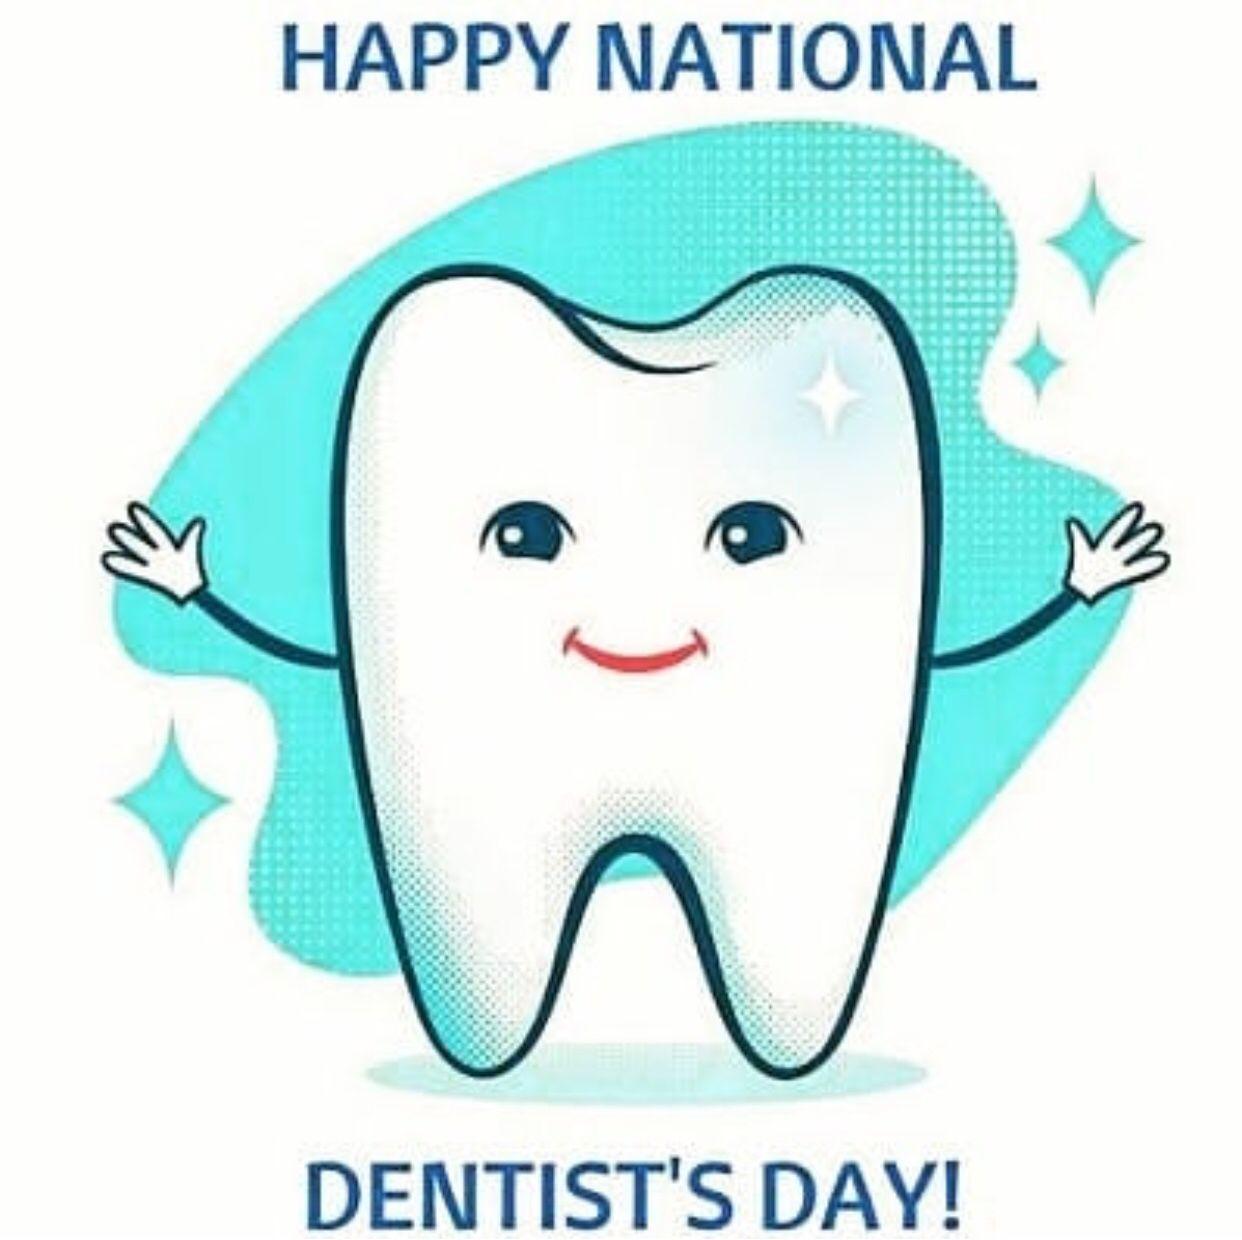 Dental peeps dentist day pediatric dentistry dental jobs